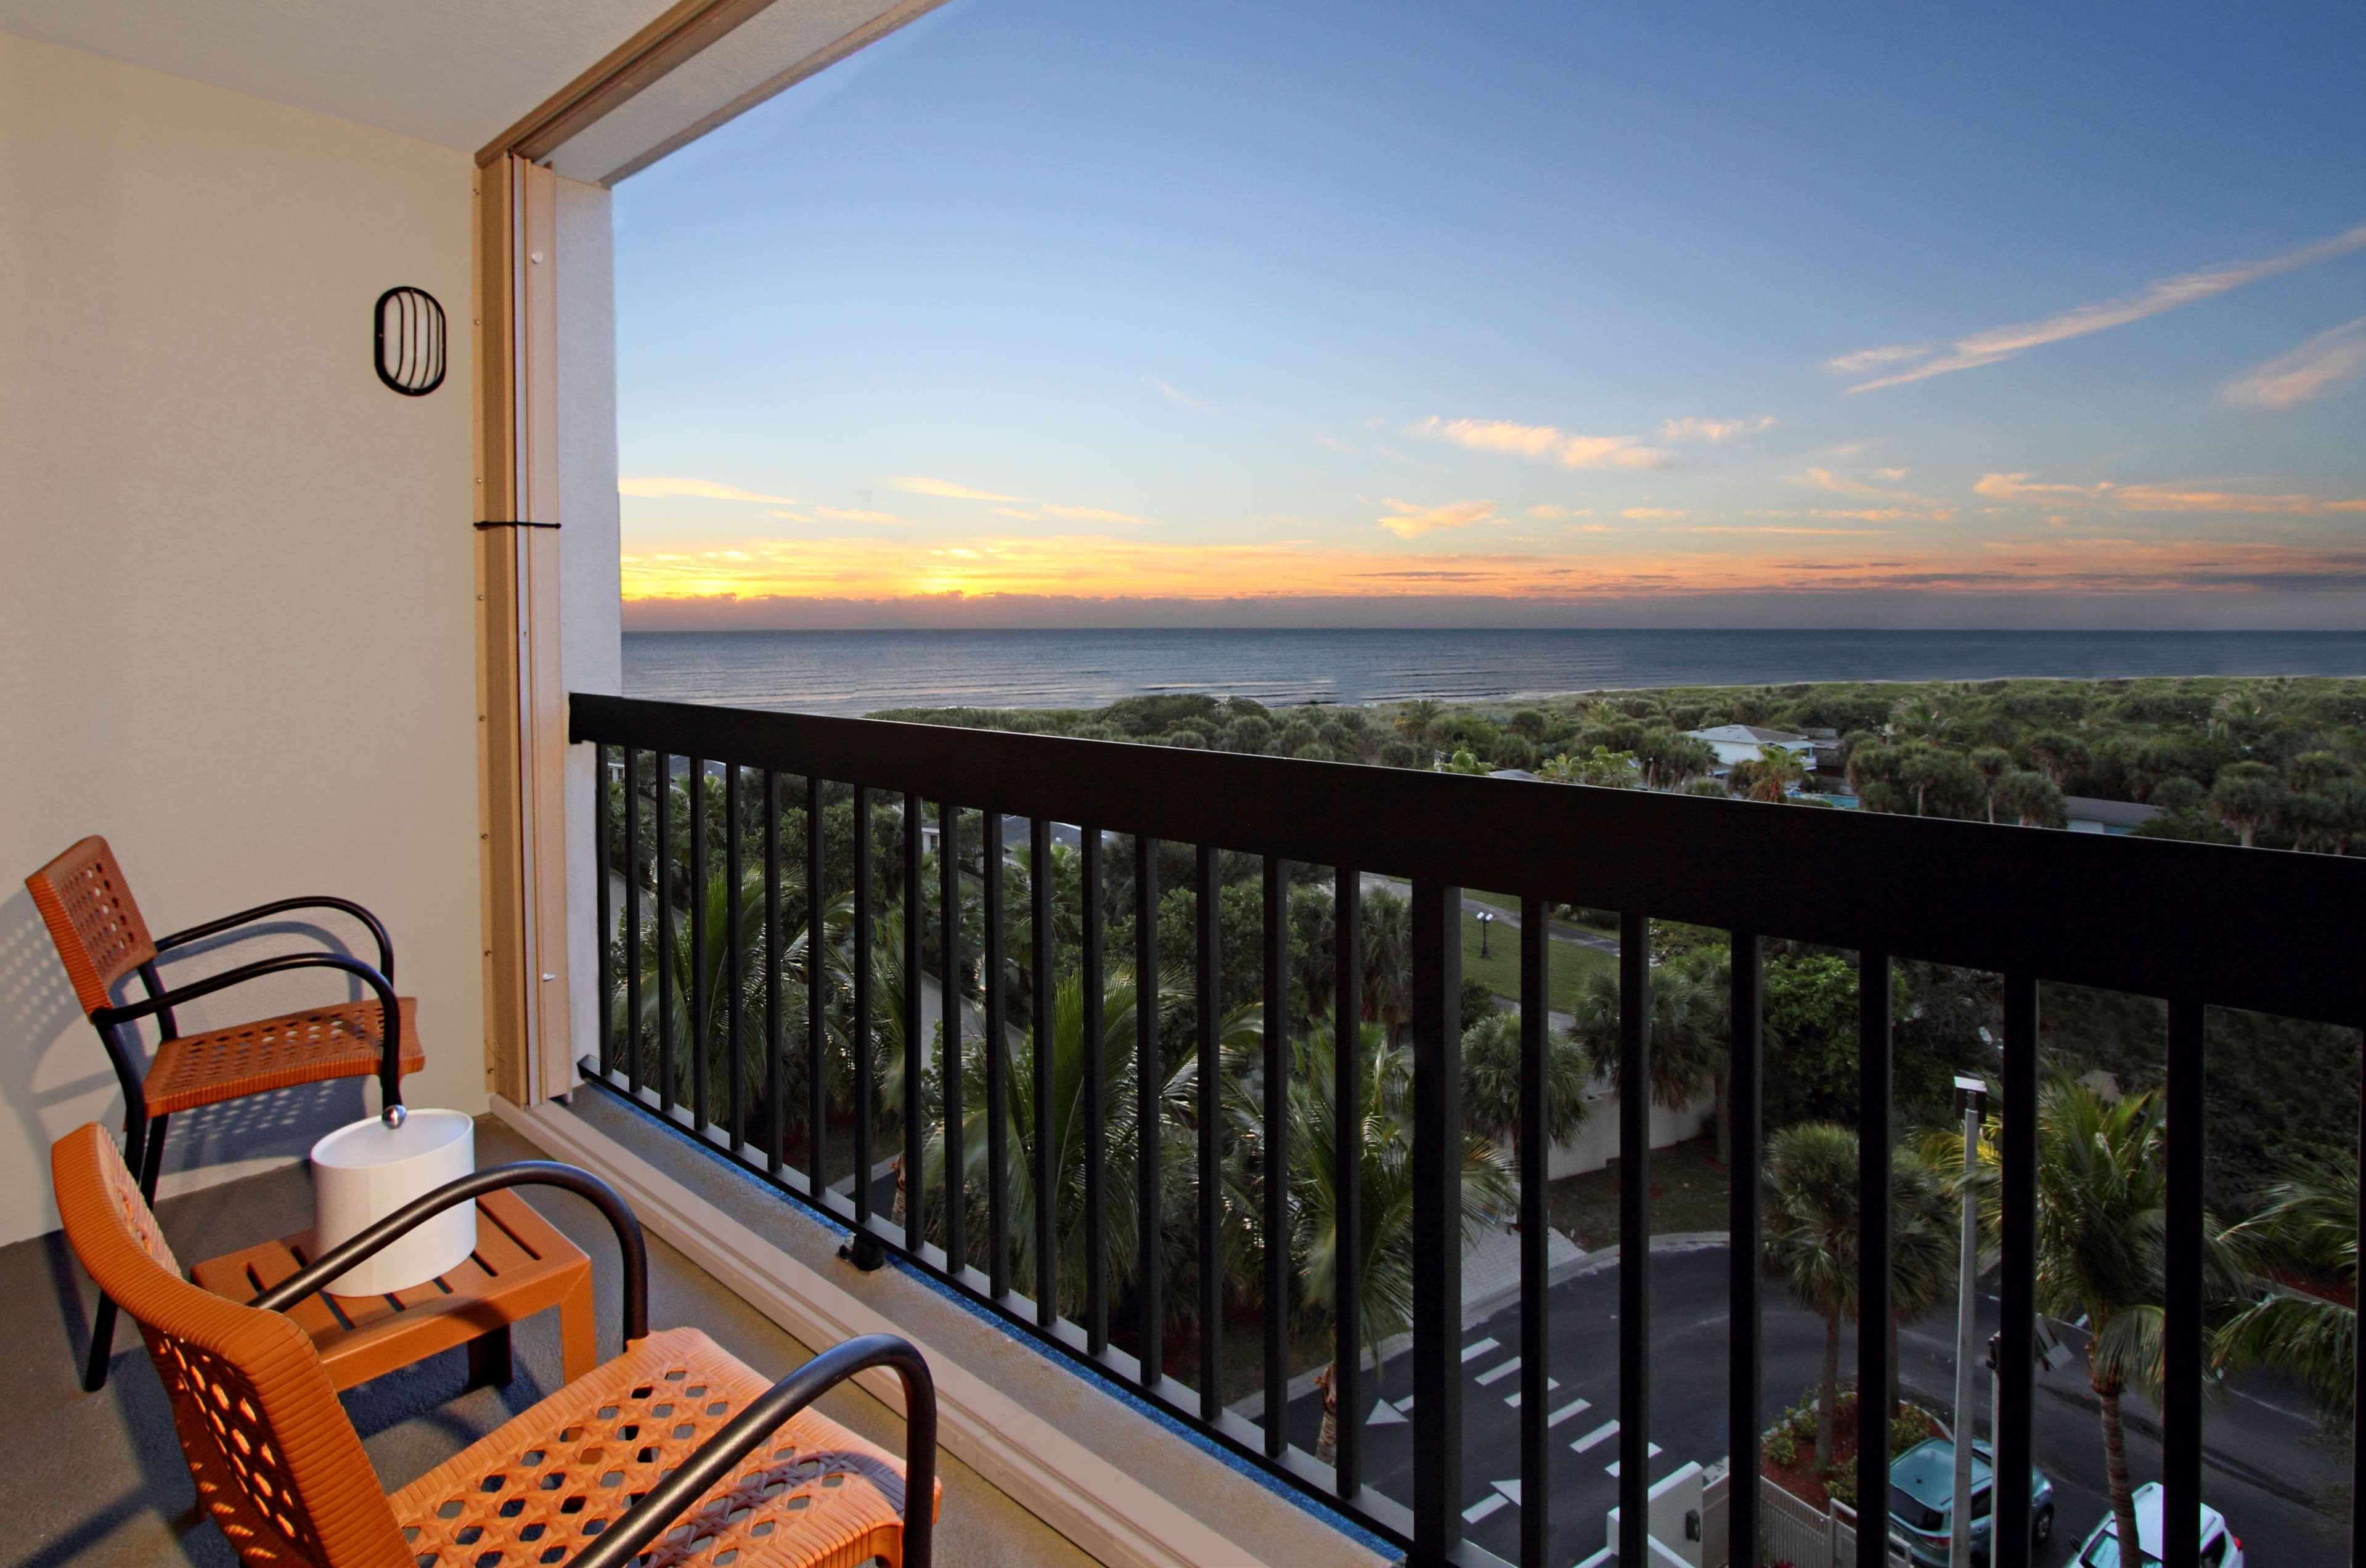 Hampton Inn Cocoa Beach/Cape Canaveral, Cocoa Beach